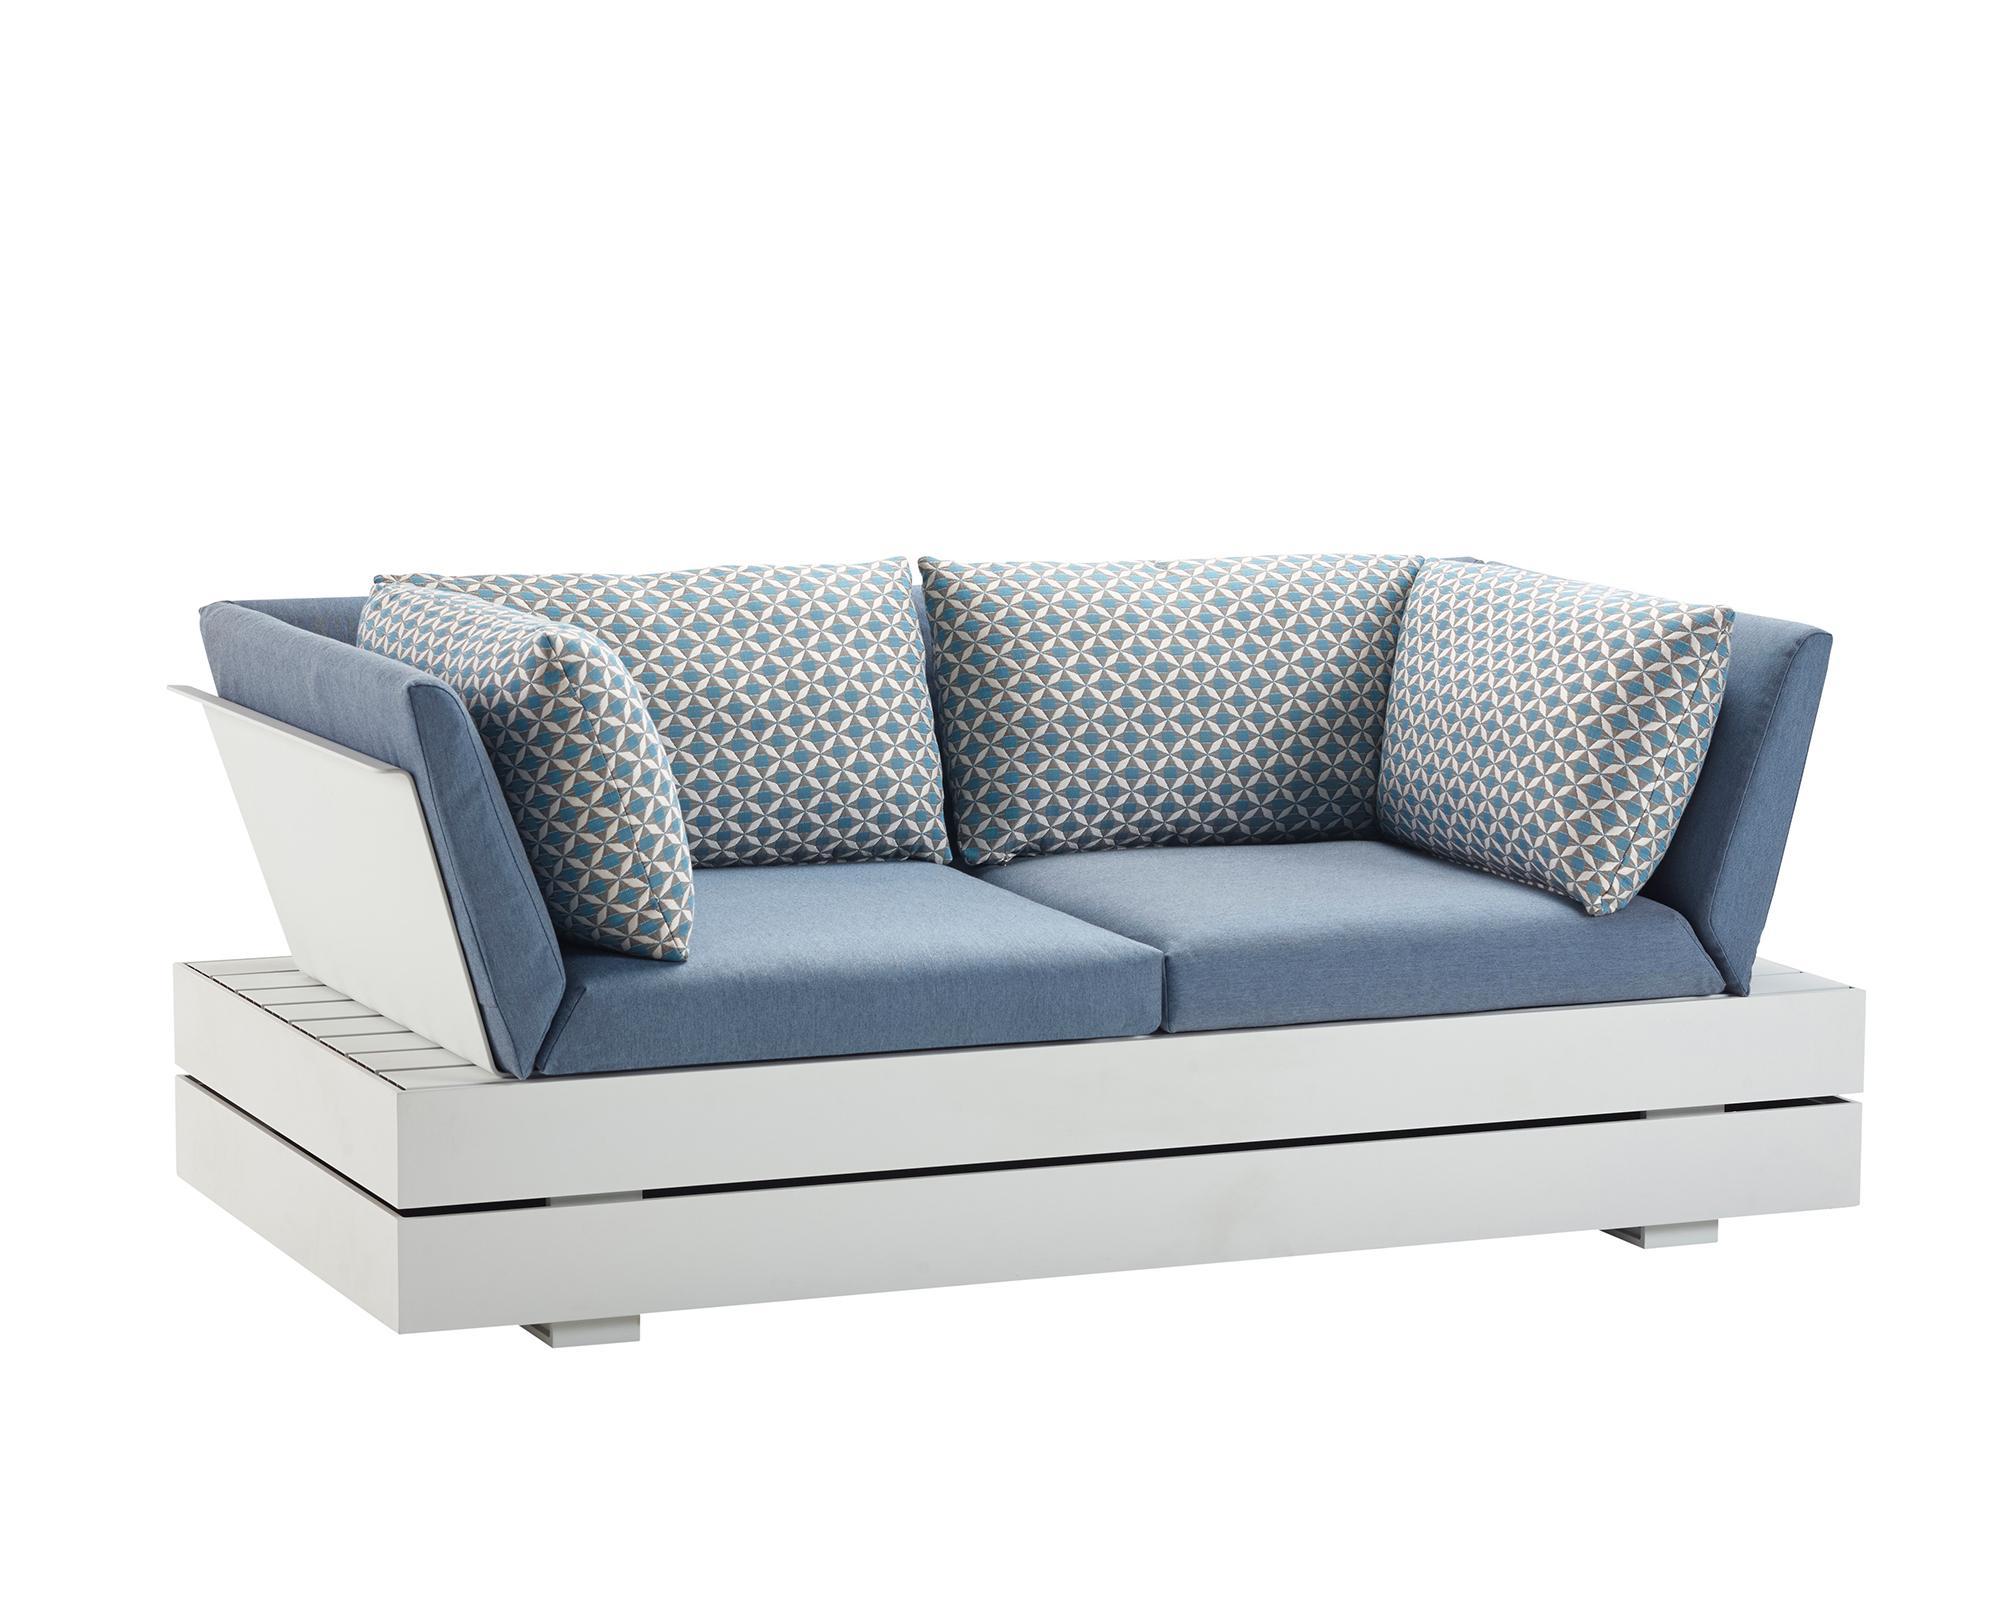 2er Lounge Sofa Balkon